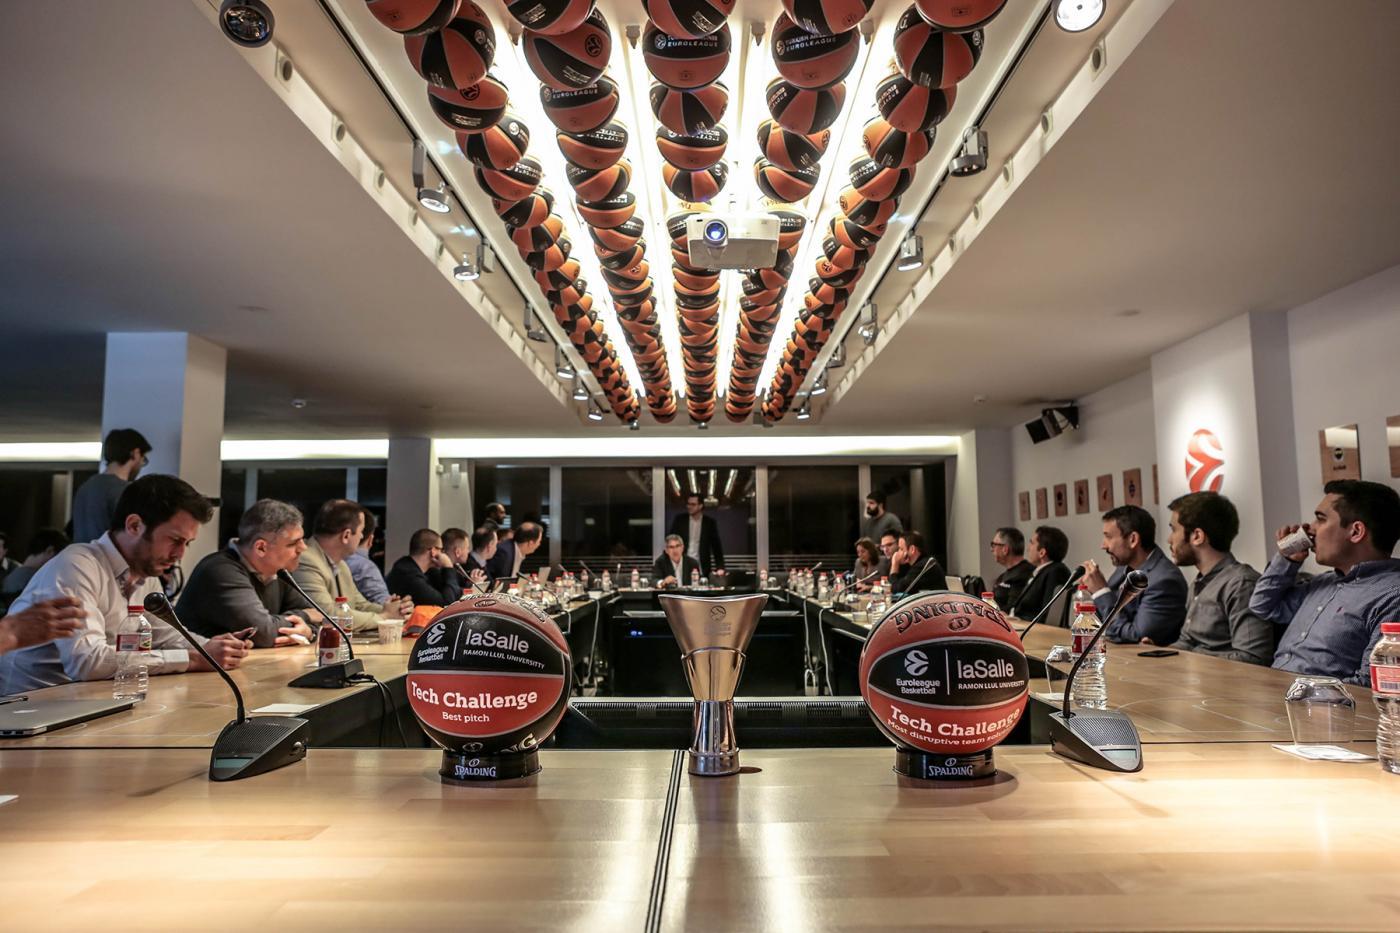 Euroleague Basketball and La Salle-URL present 2019 Tech